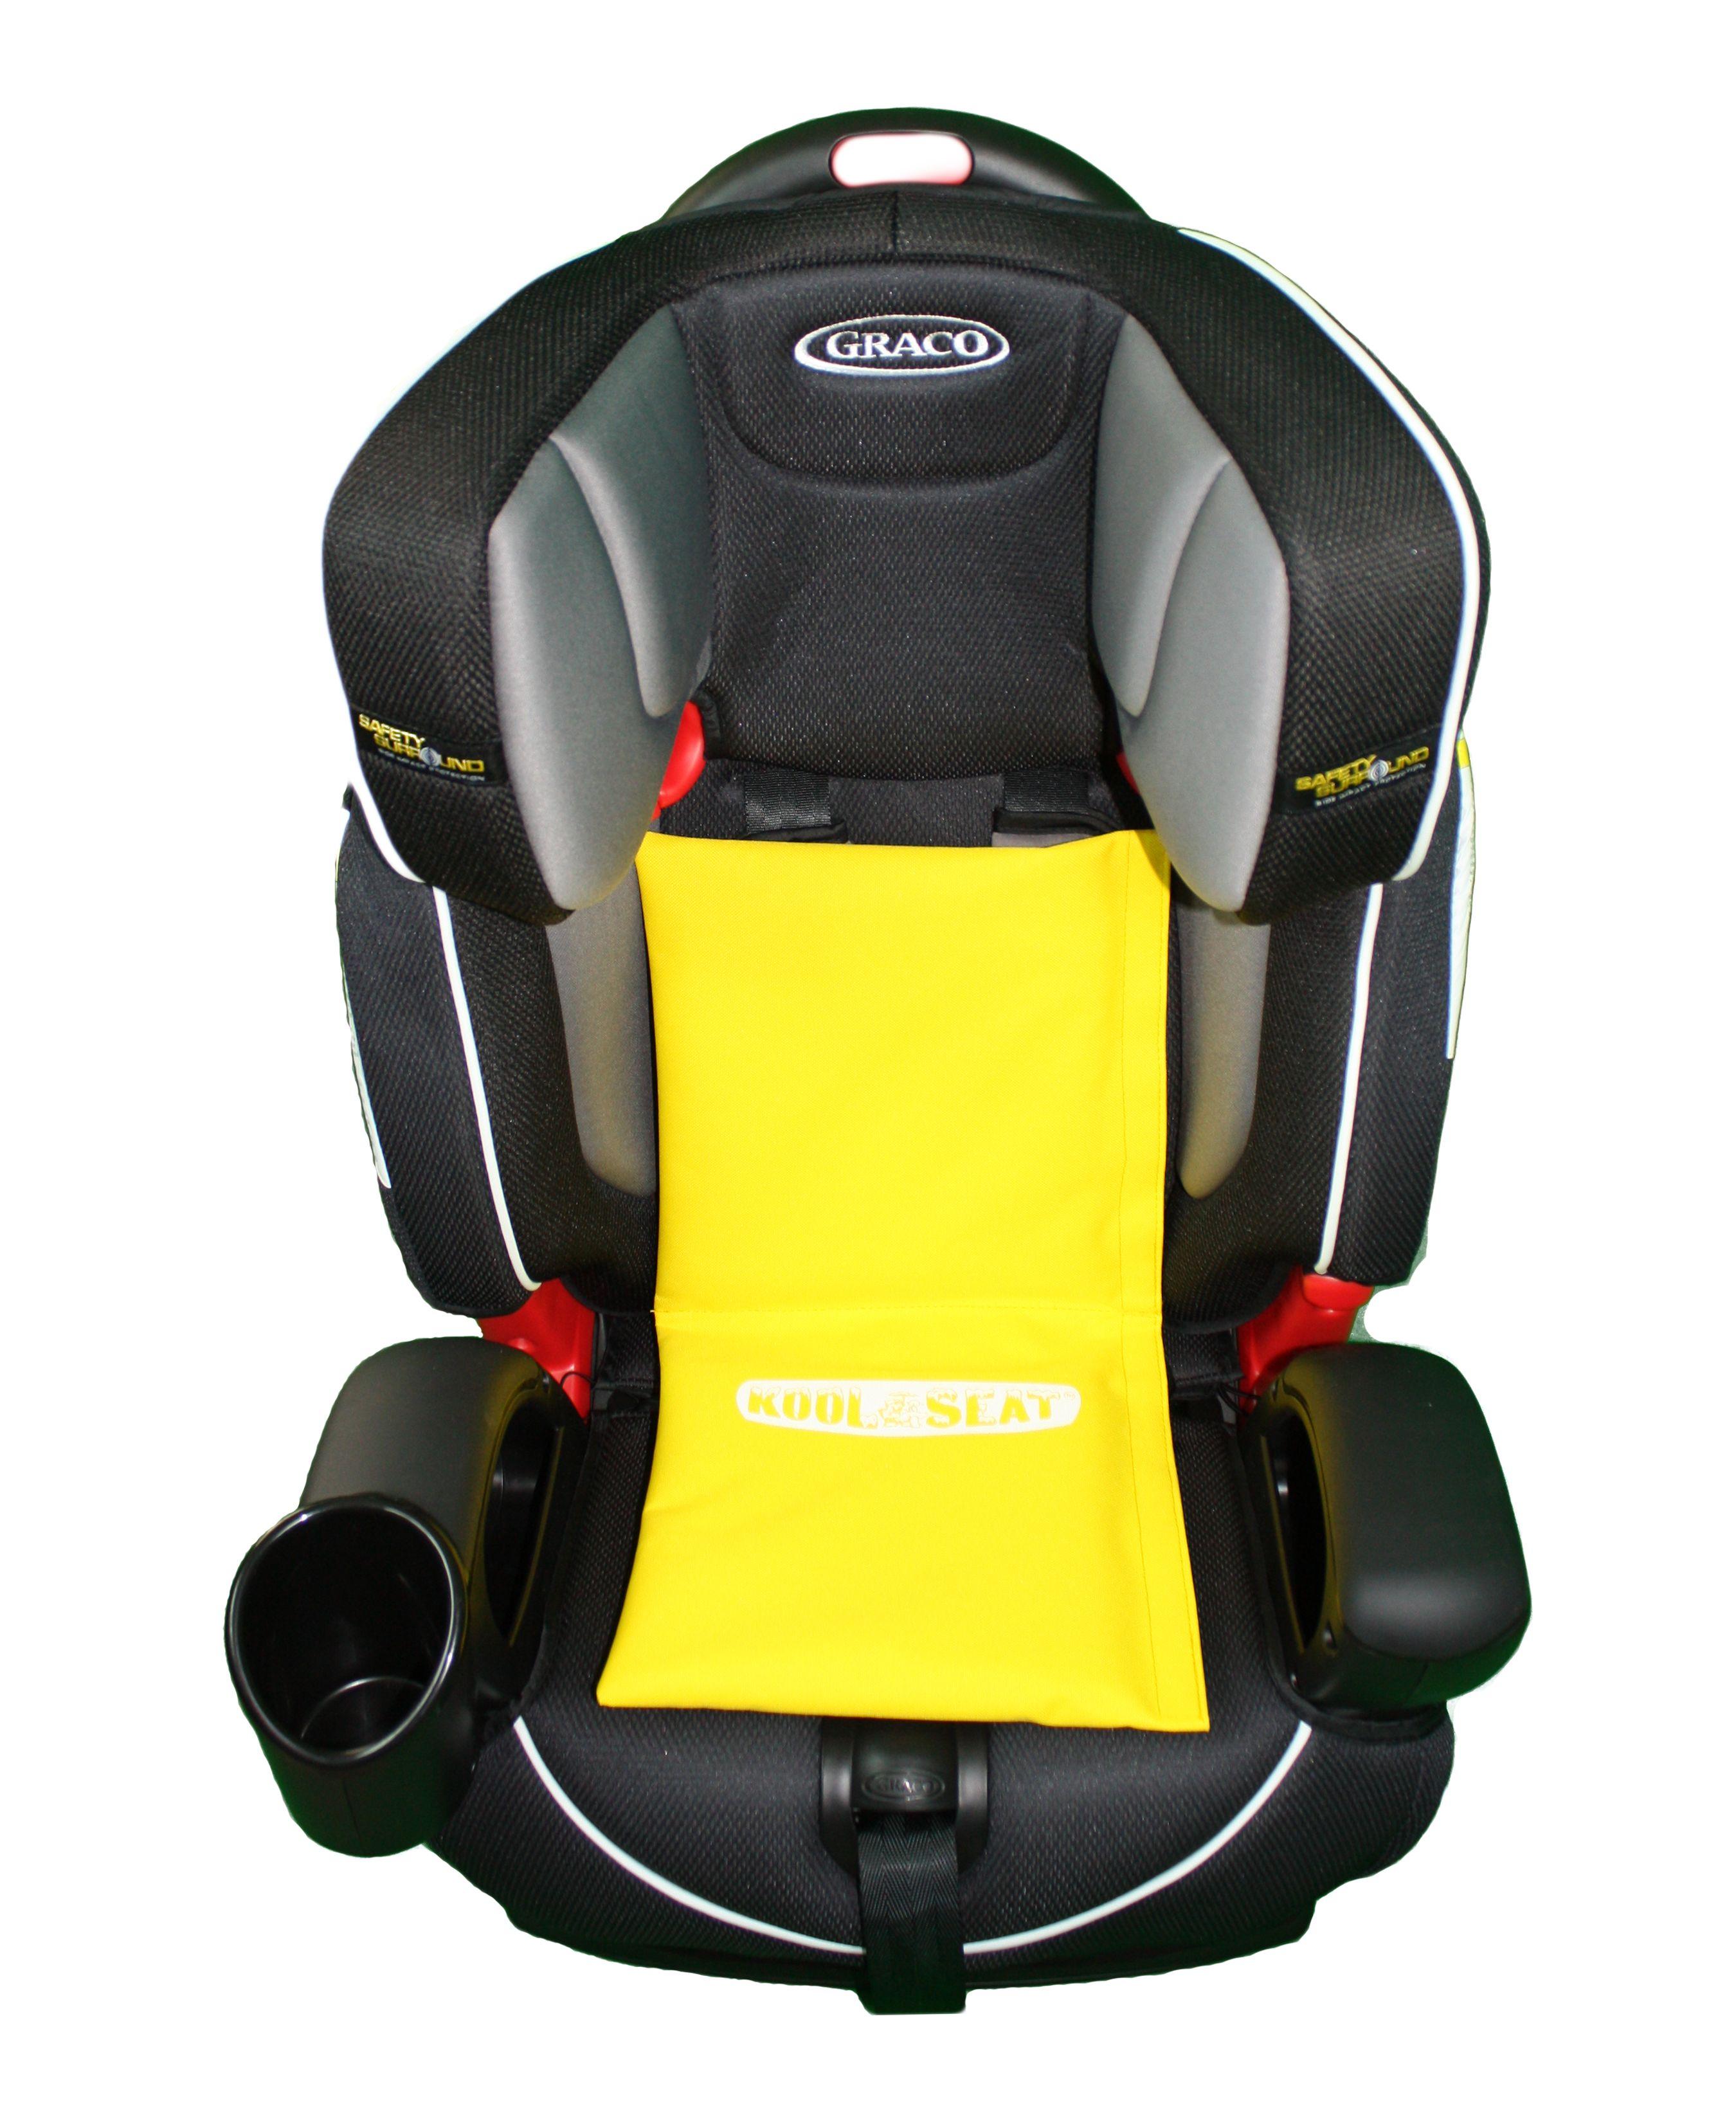 The Yellow Kool Seat Car Seat Cooler Pad Baby Car Seats Car